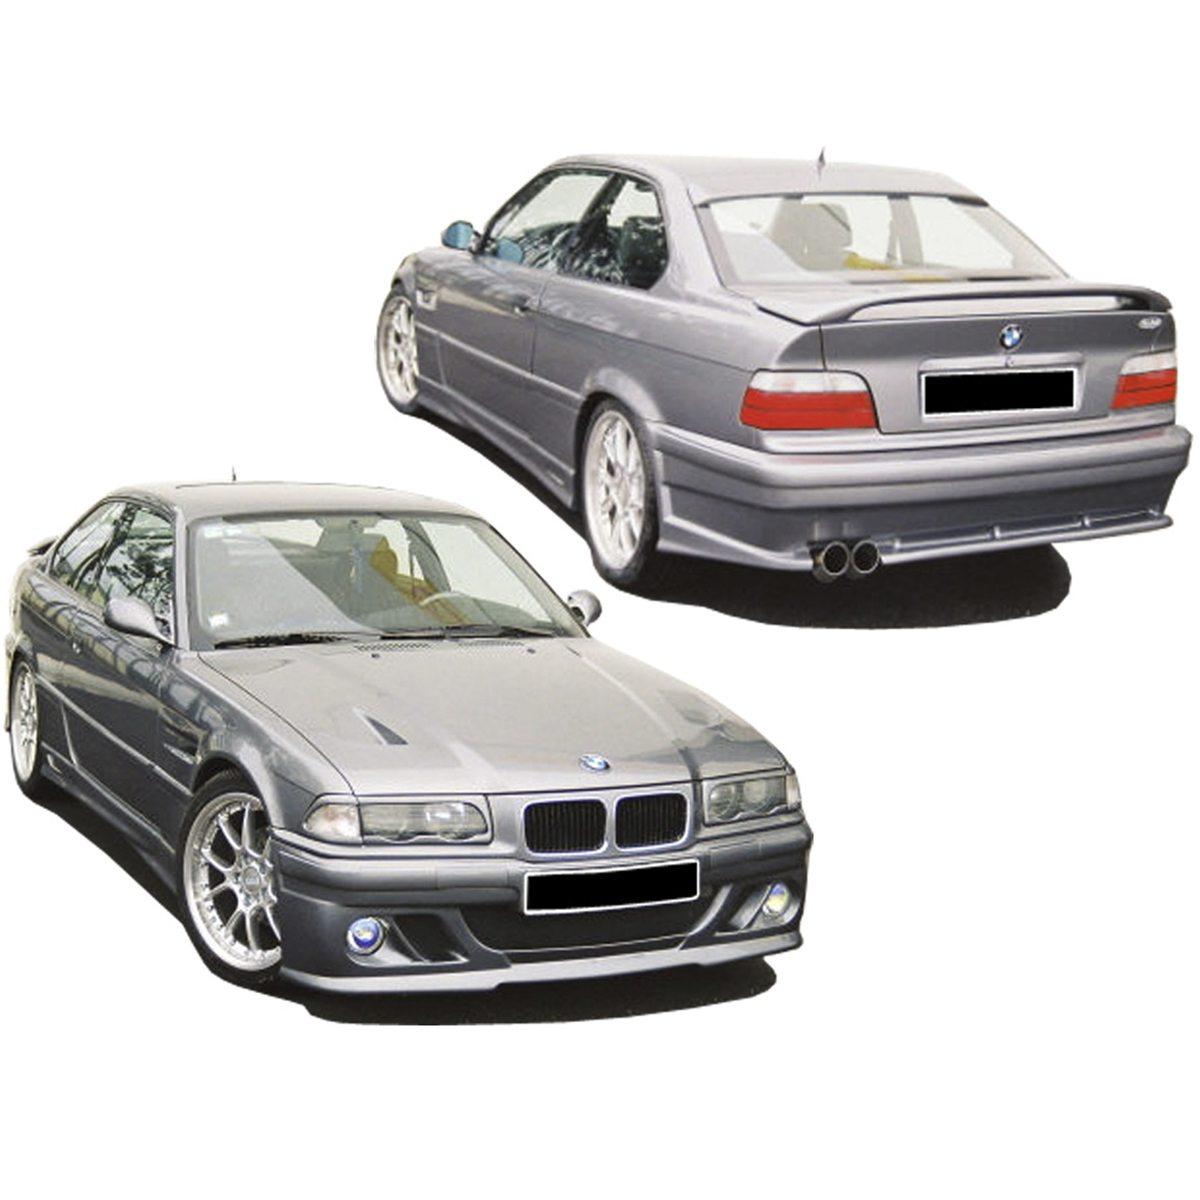 BMW-E36-Illusion-KIT-QTU082